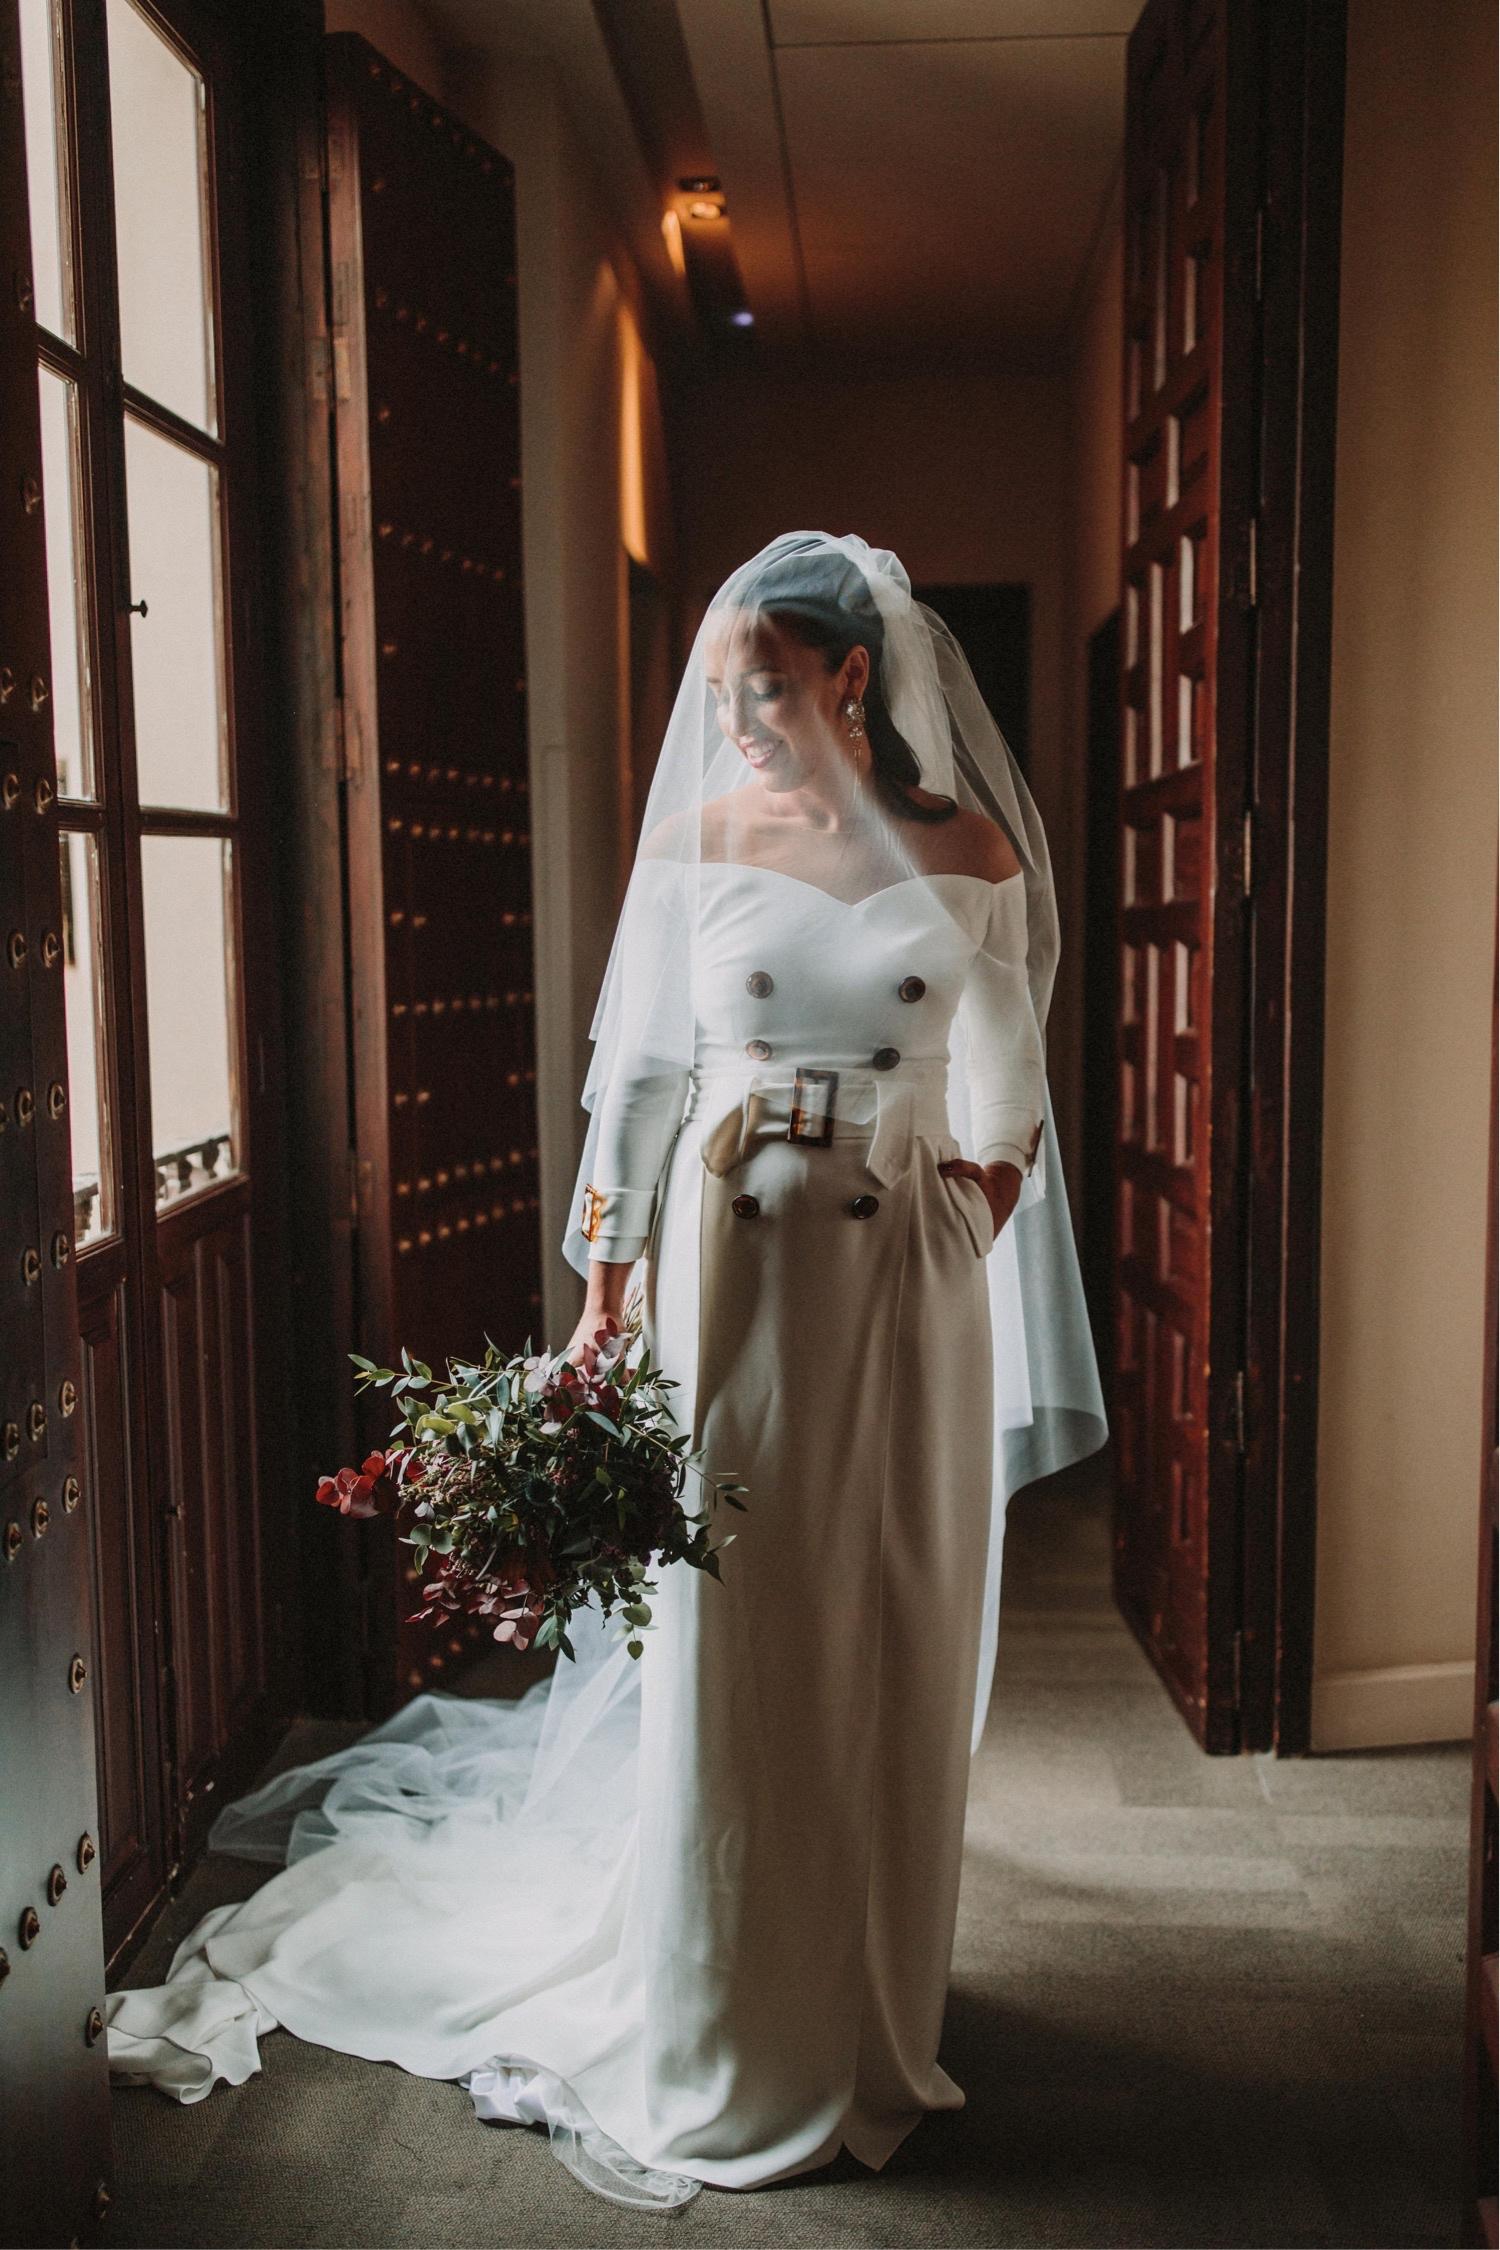 09_wedding-ernestovillalba-anabel-diego-1076-ASE.jpg